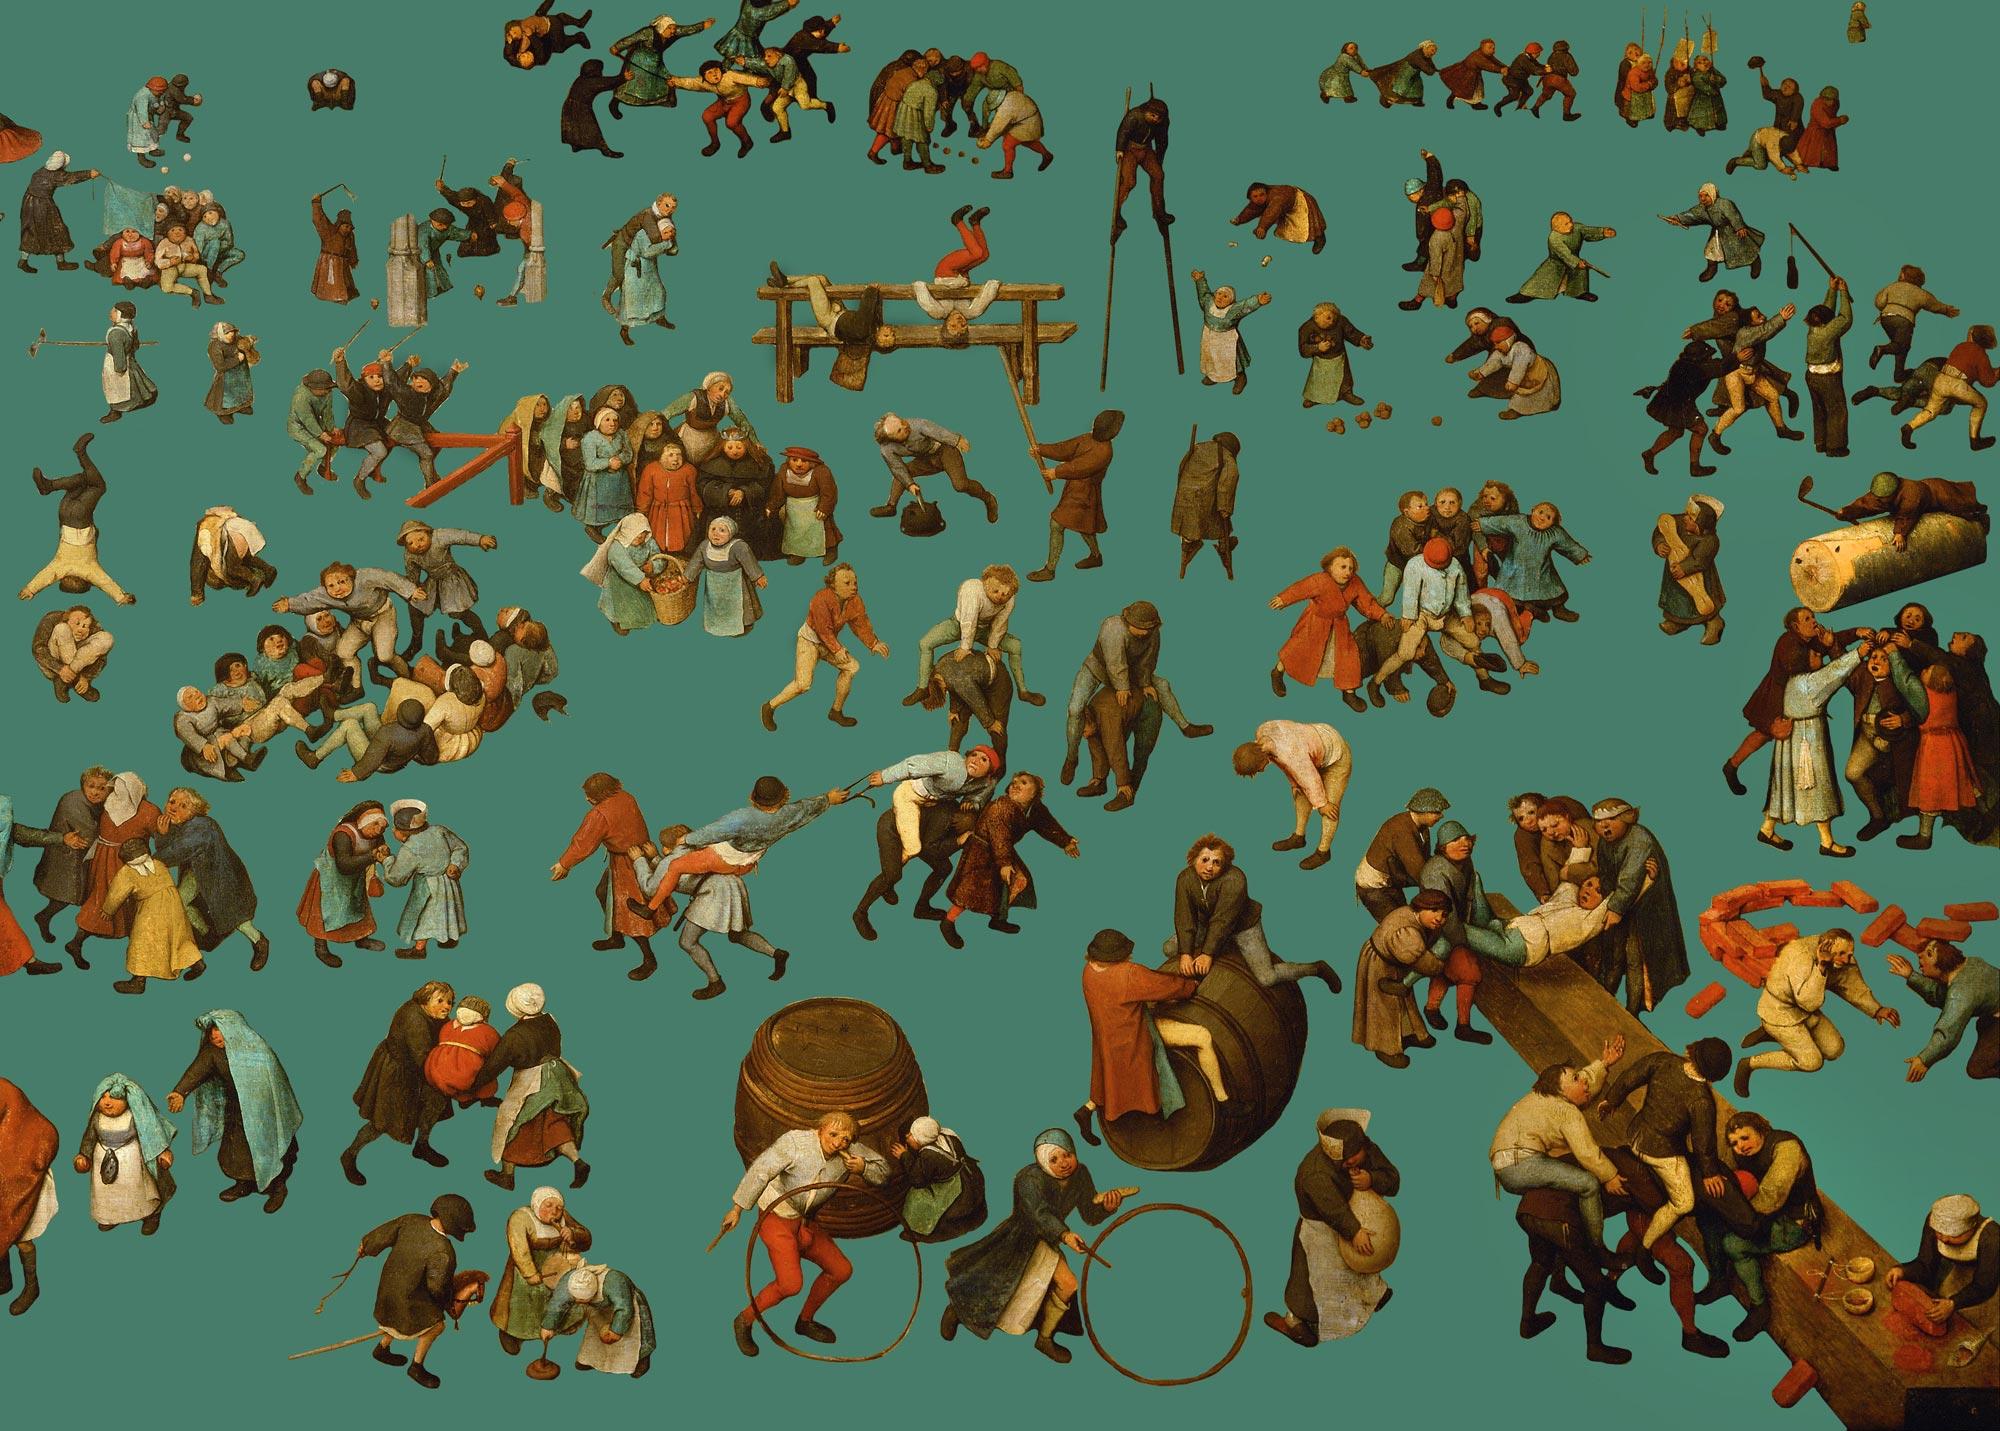 Graphic representation from Pieter Bruegel the Elder, Children's Games, 1560